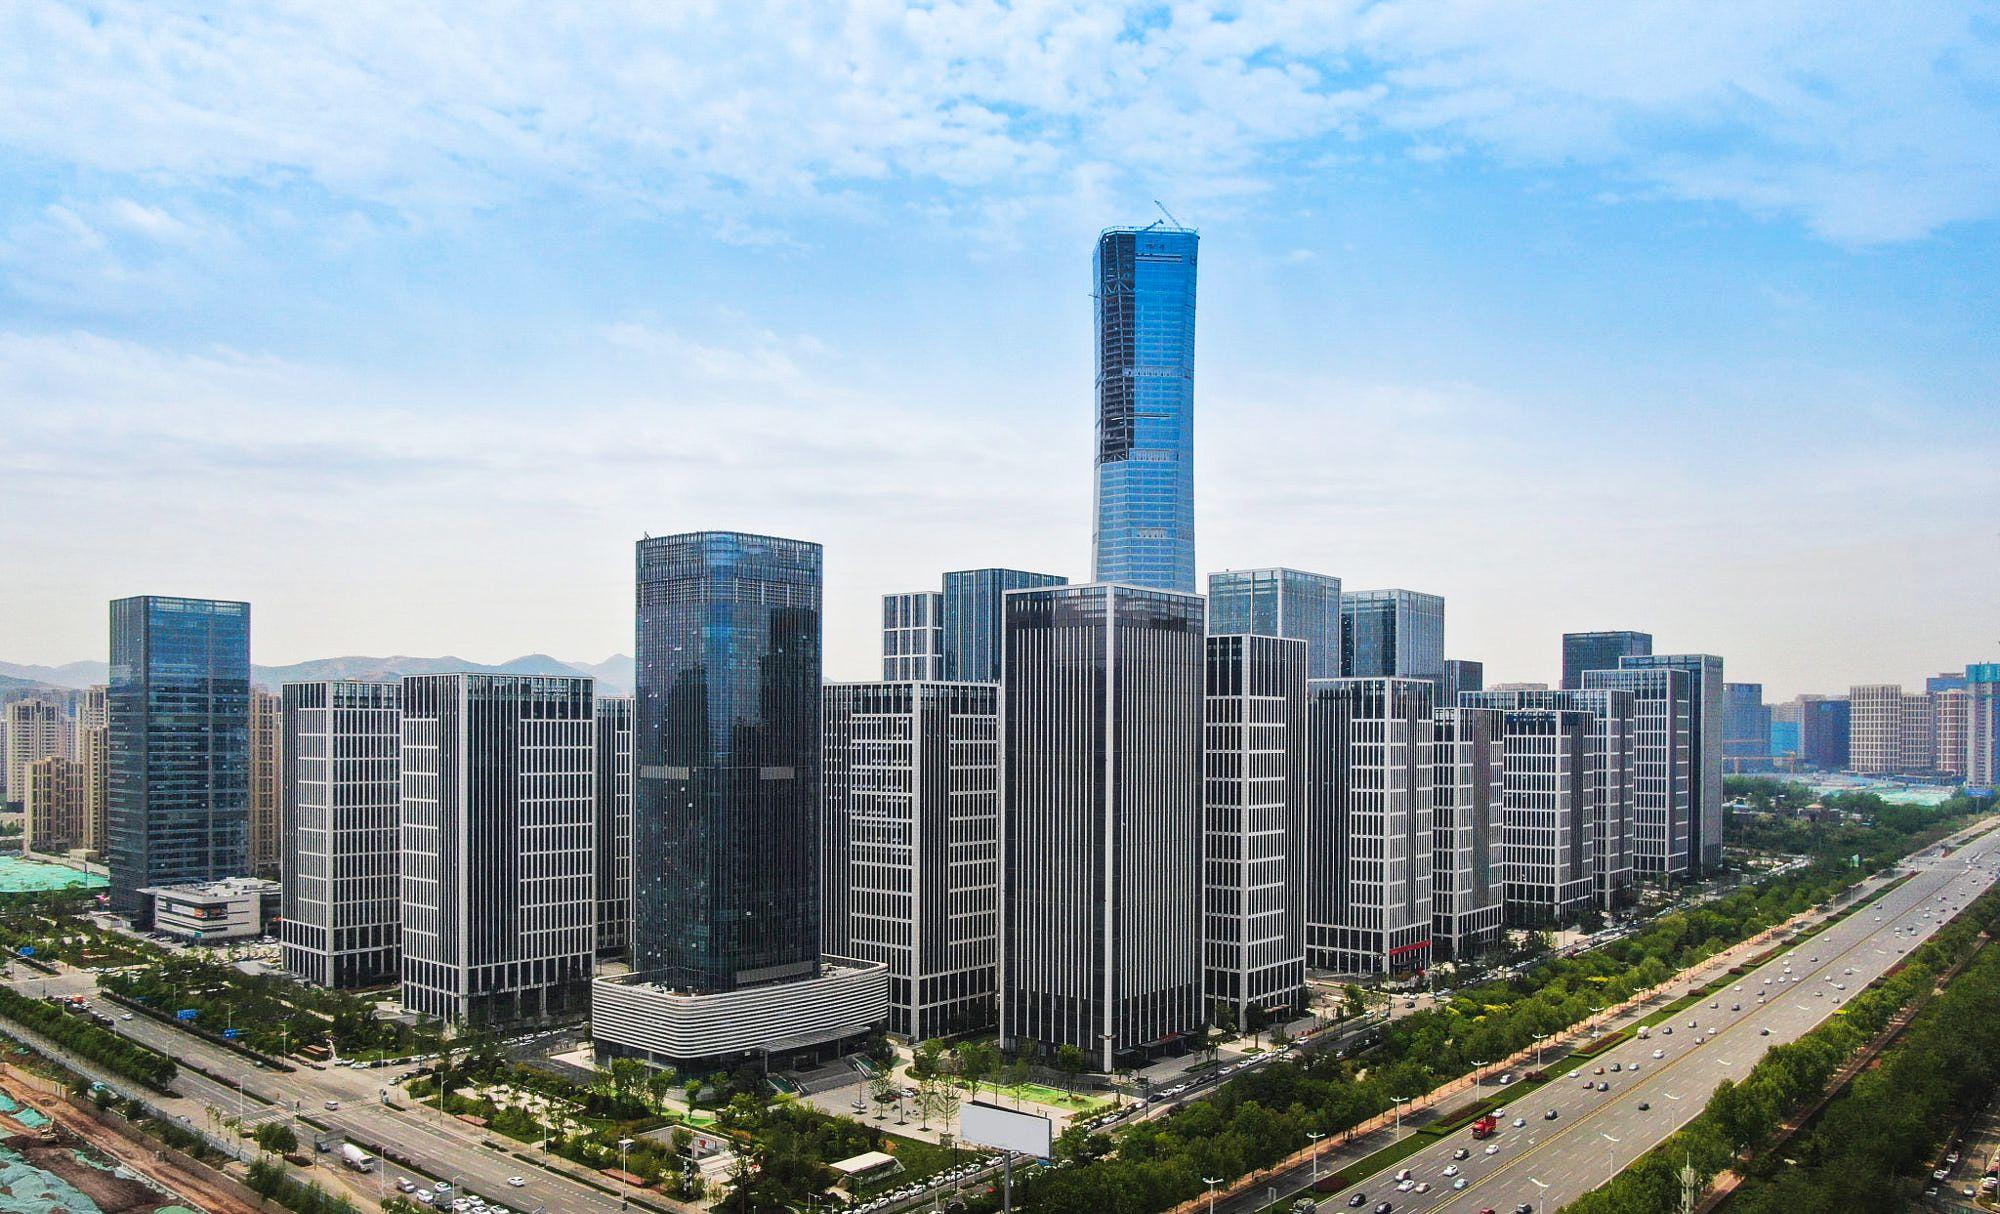 Jinan 济南 Jinan City Capital Of Shandong Province Northern China Jinan Skyline World Photo